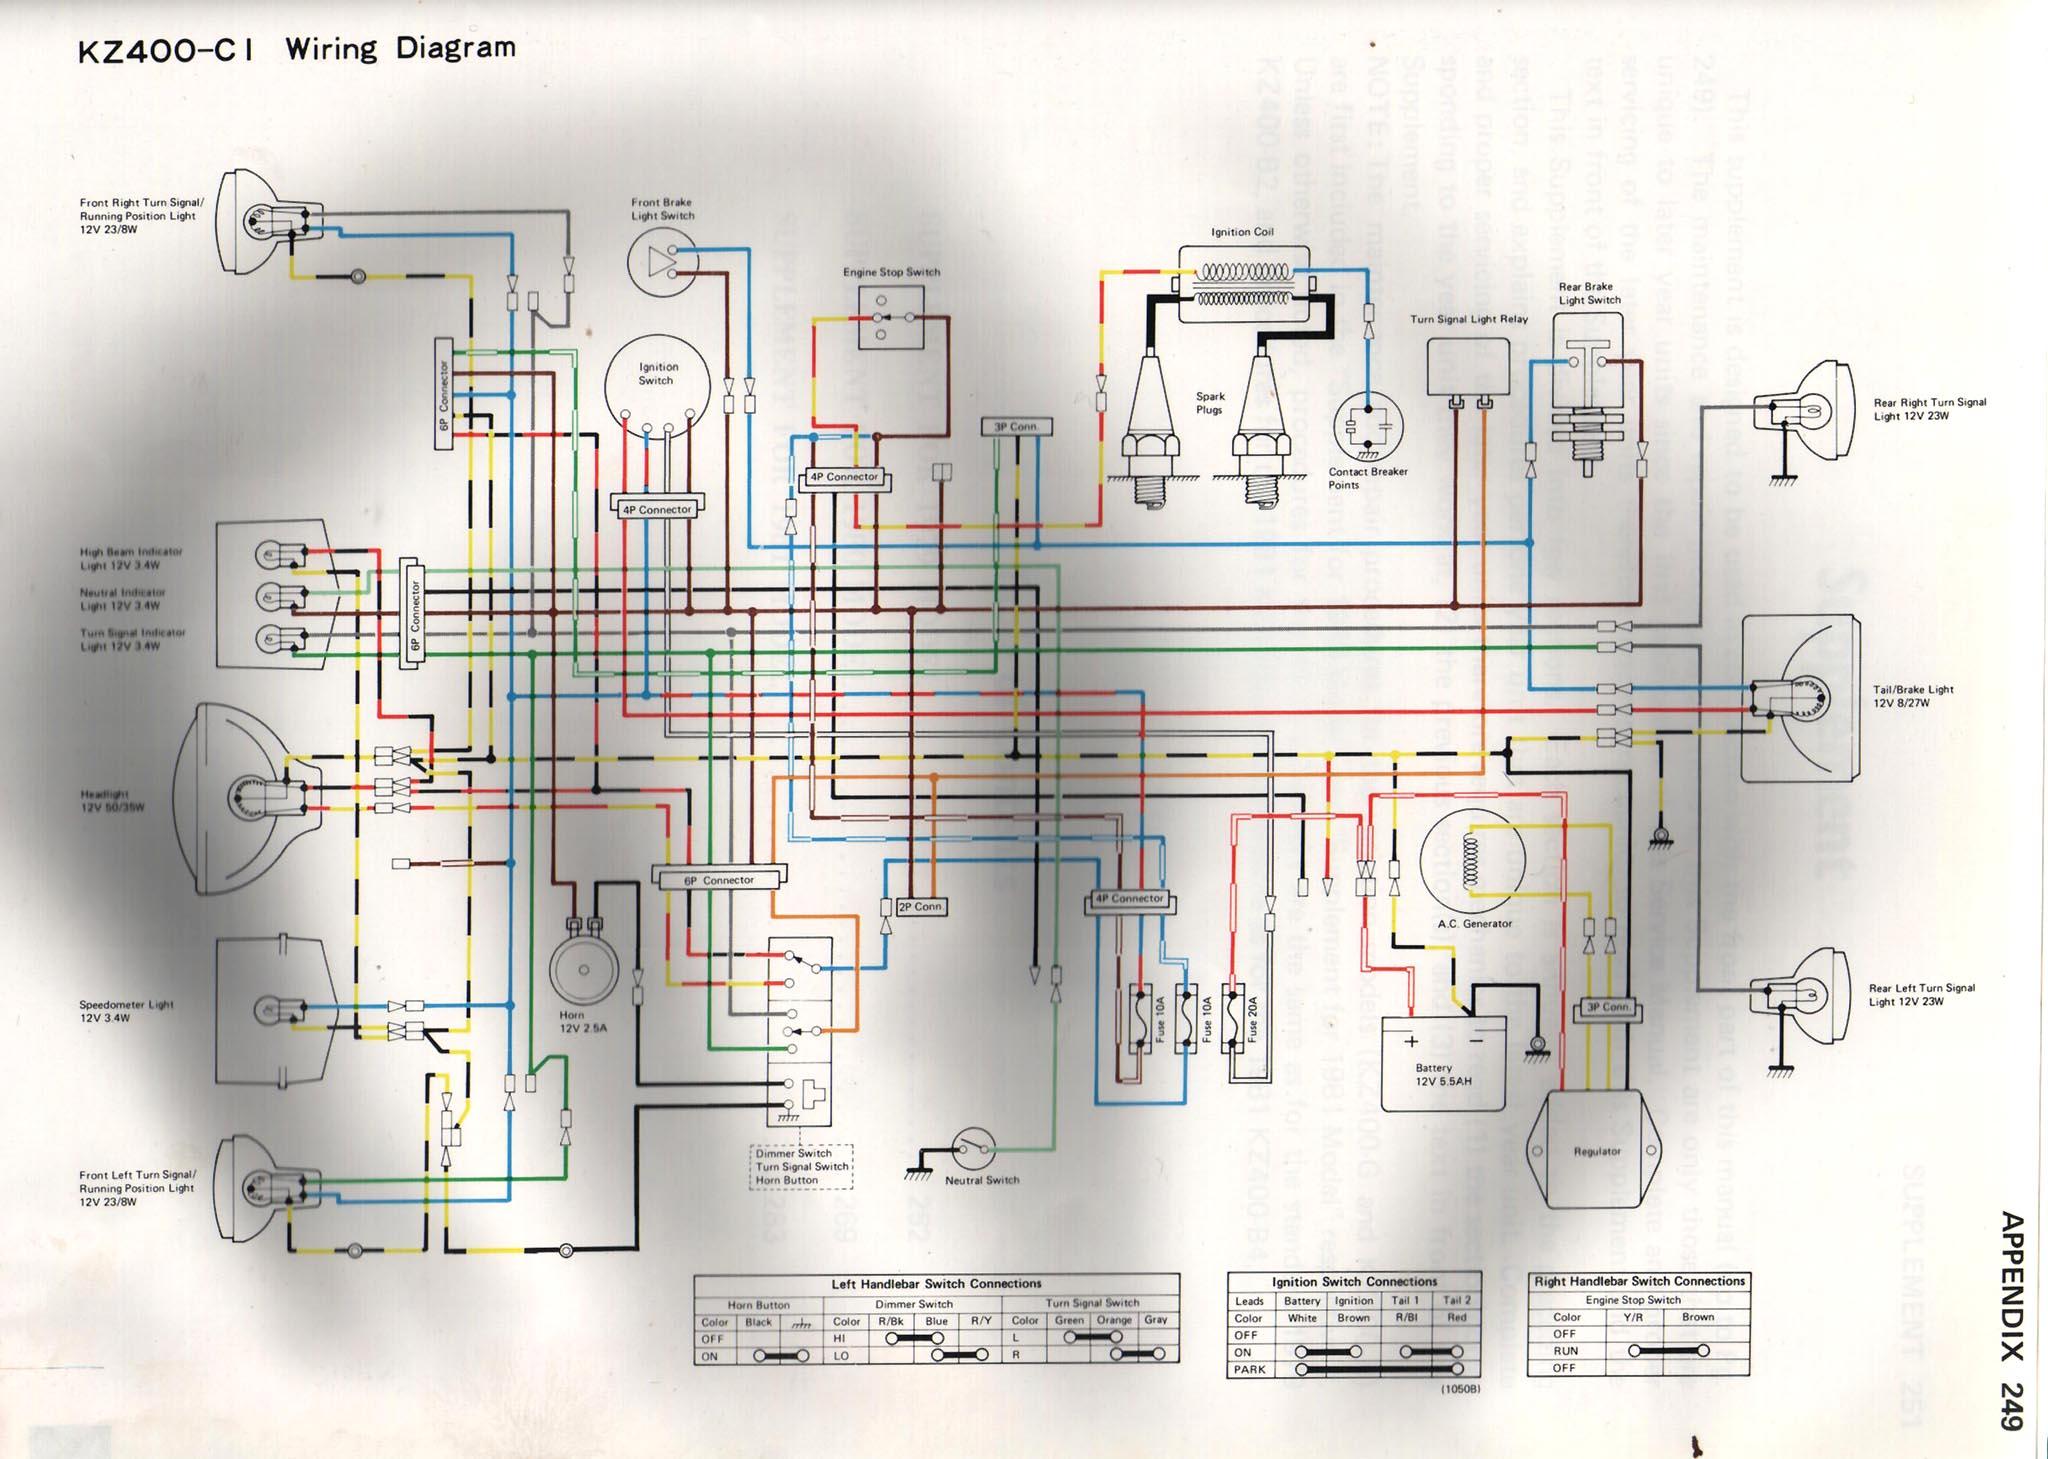 lg schematic diagrams model 47ln5400 ua wiring diagram. Black Bedroom Furniture Sets. Home Design Ideas